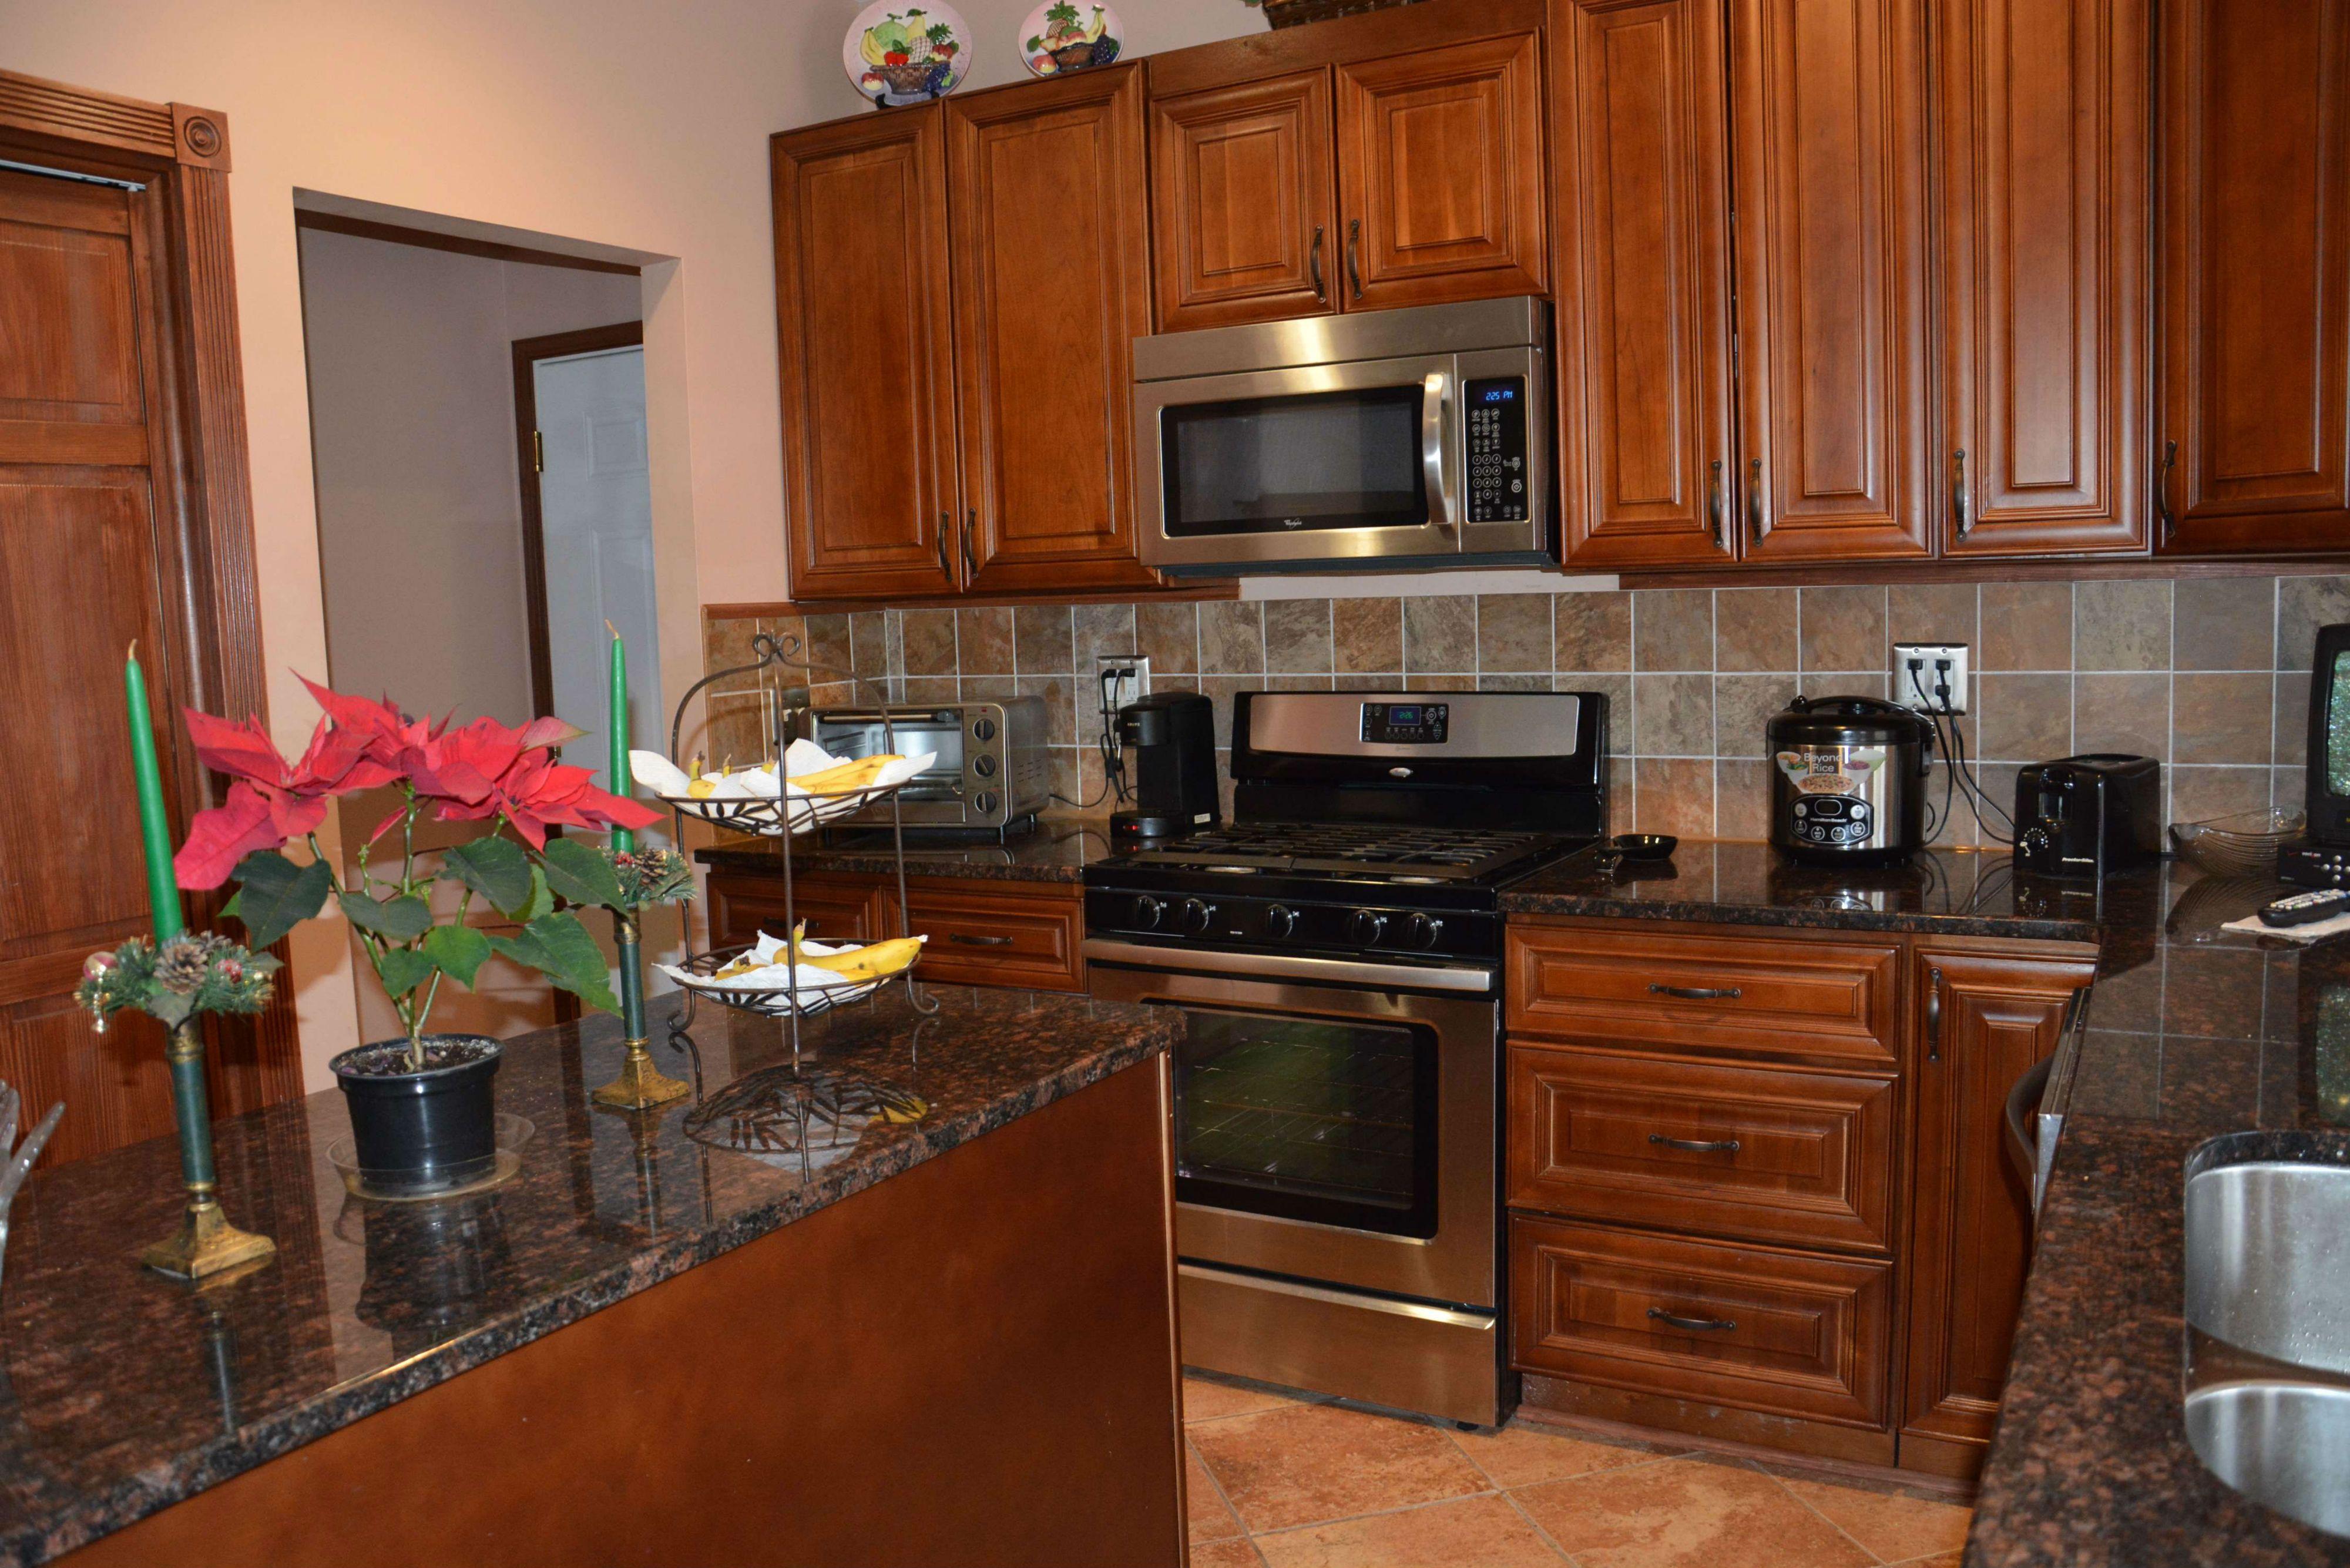 A view of the kitchen at 42 Branford Circle, Tinton Falls.